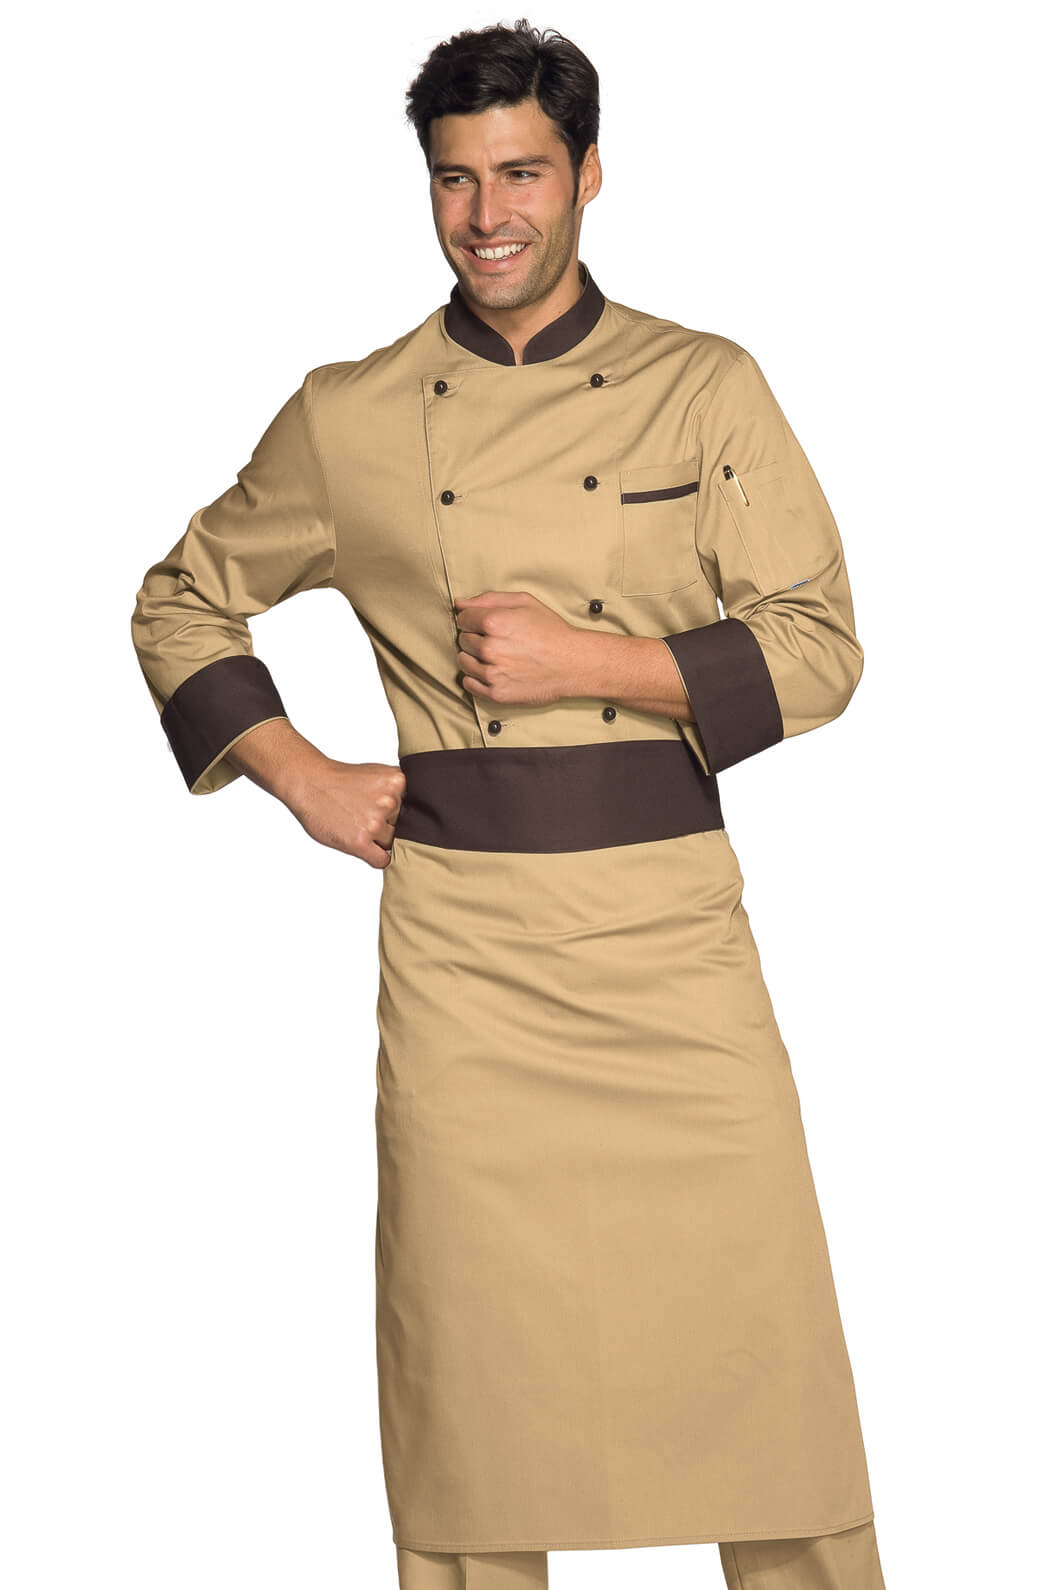 Veste chef cuisinier biscuit liser marron cacao for Cuisinier particulier